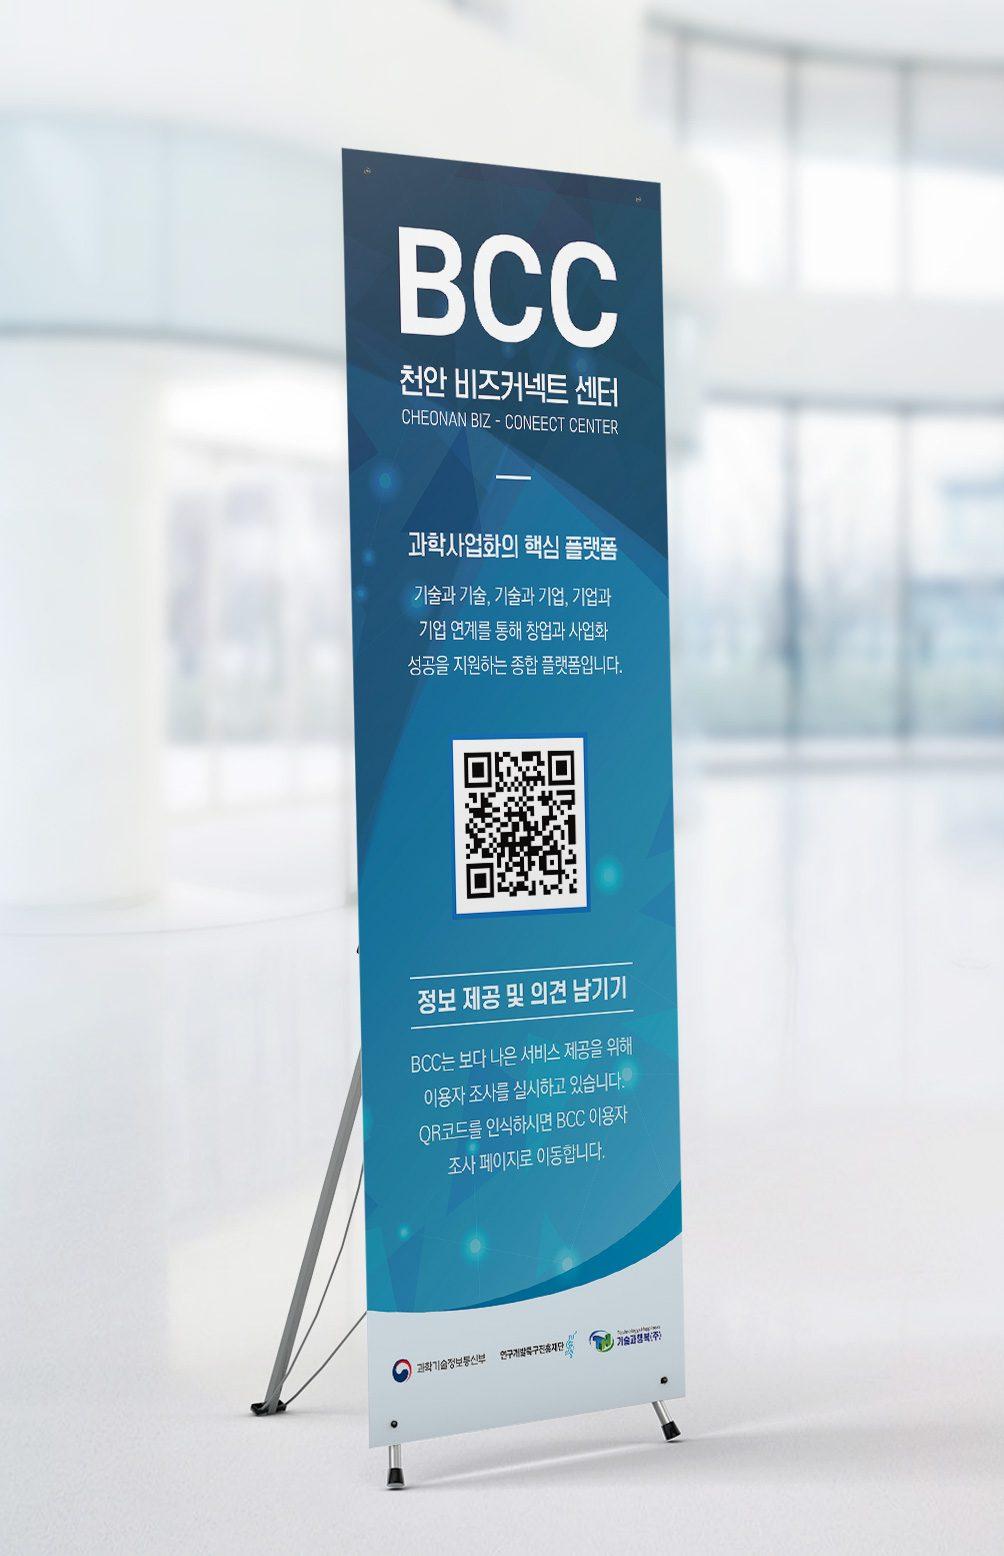 bcc-banner-01